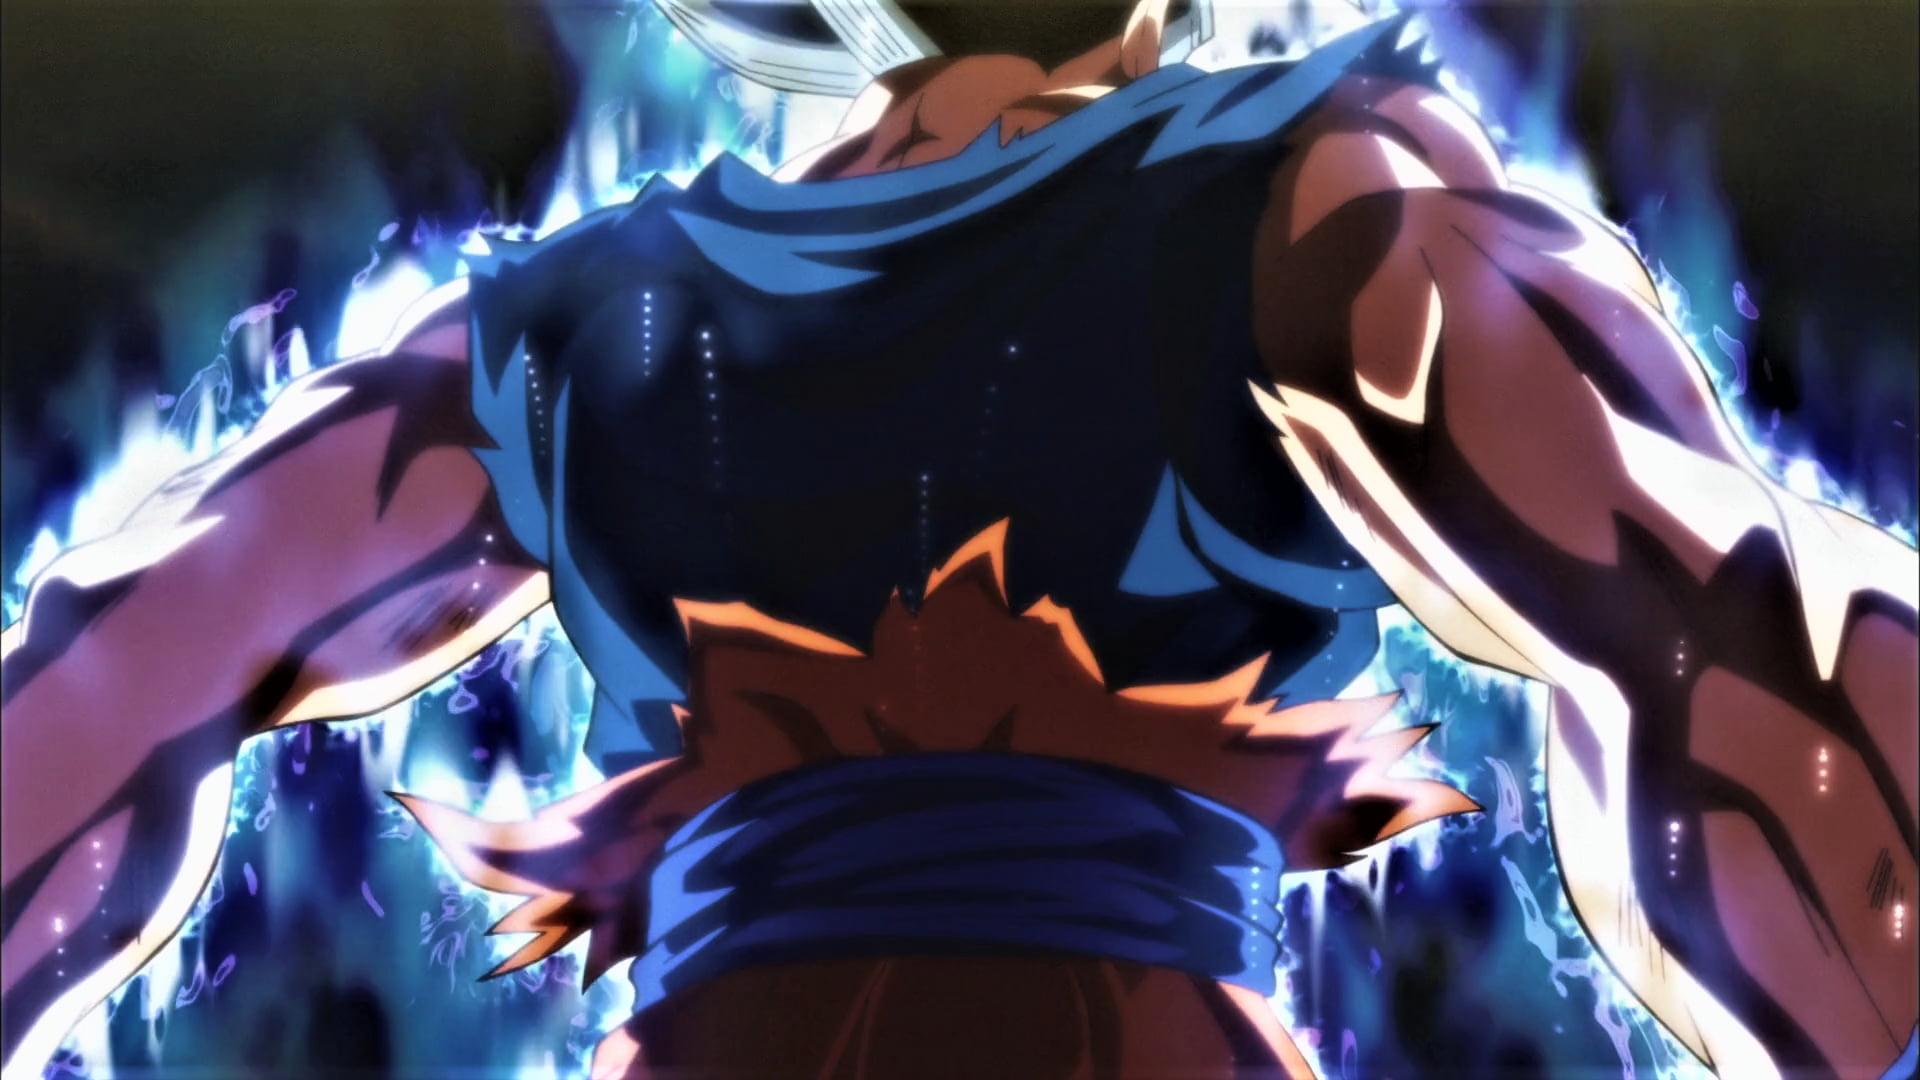 Goku Ultra Instinct Wallpaper Gif 1920x1080 Wallpaper Teahub Io